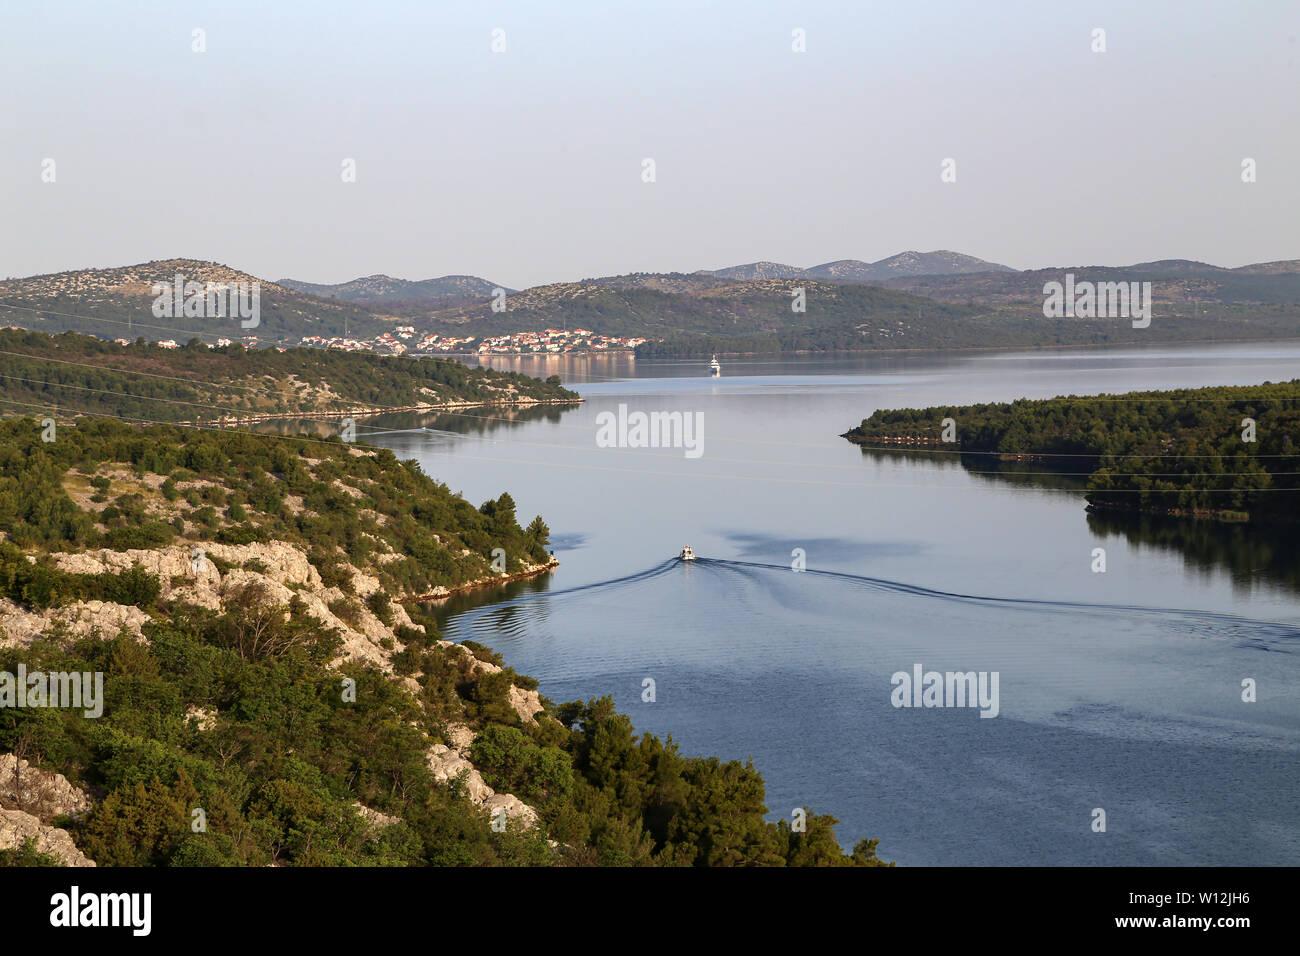 Von der Mündung des Flusses Krka Skradin - Krka Brücke. Stockfoto